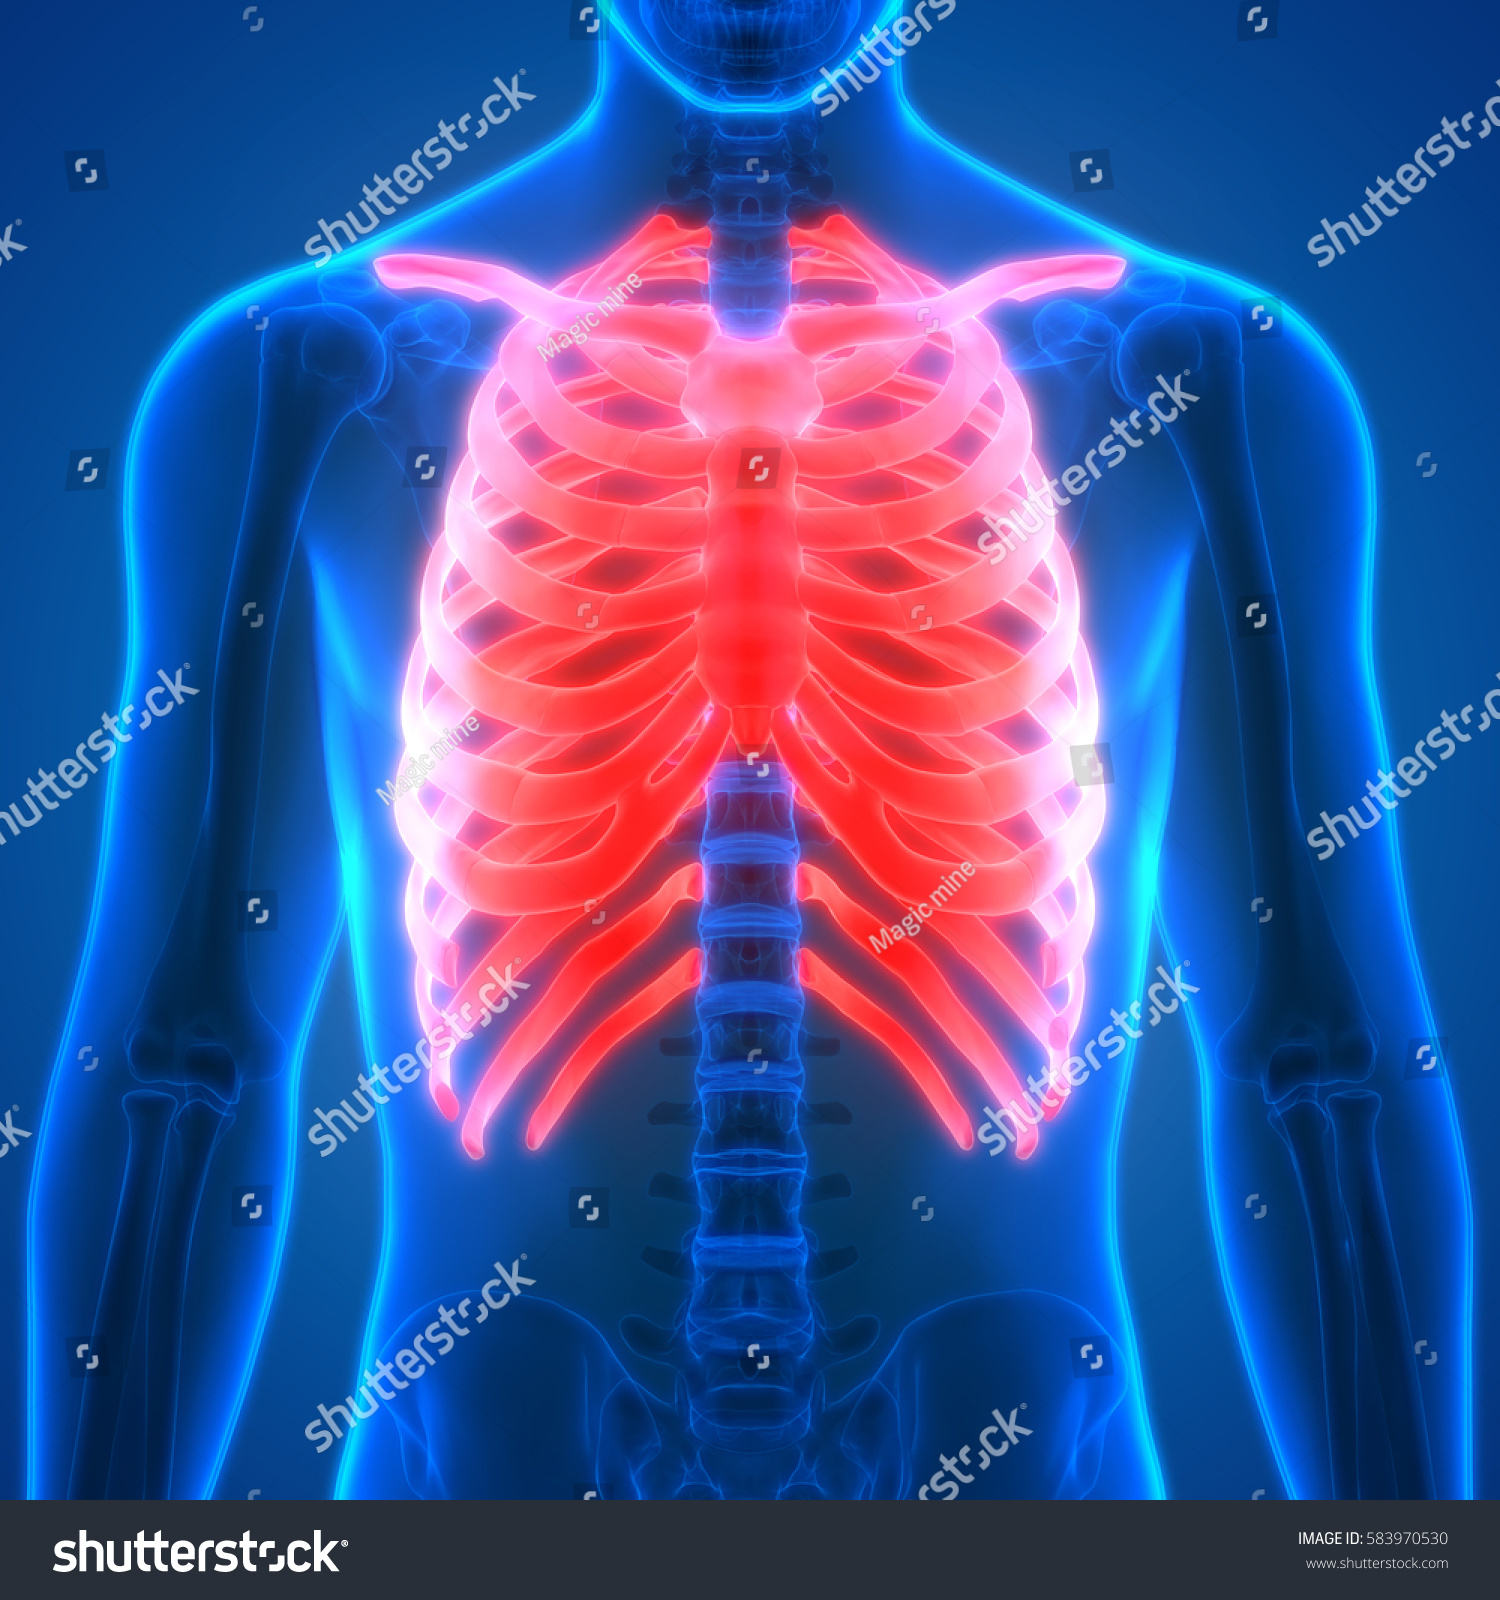 Human Body Bone Joint Pains Anatomy Stock Illustration 583970530 ...